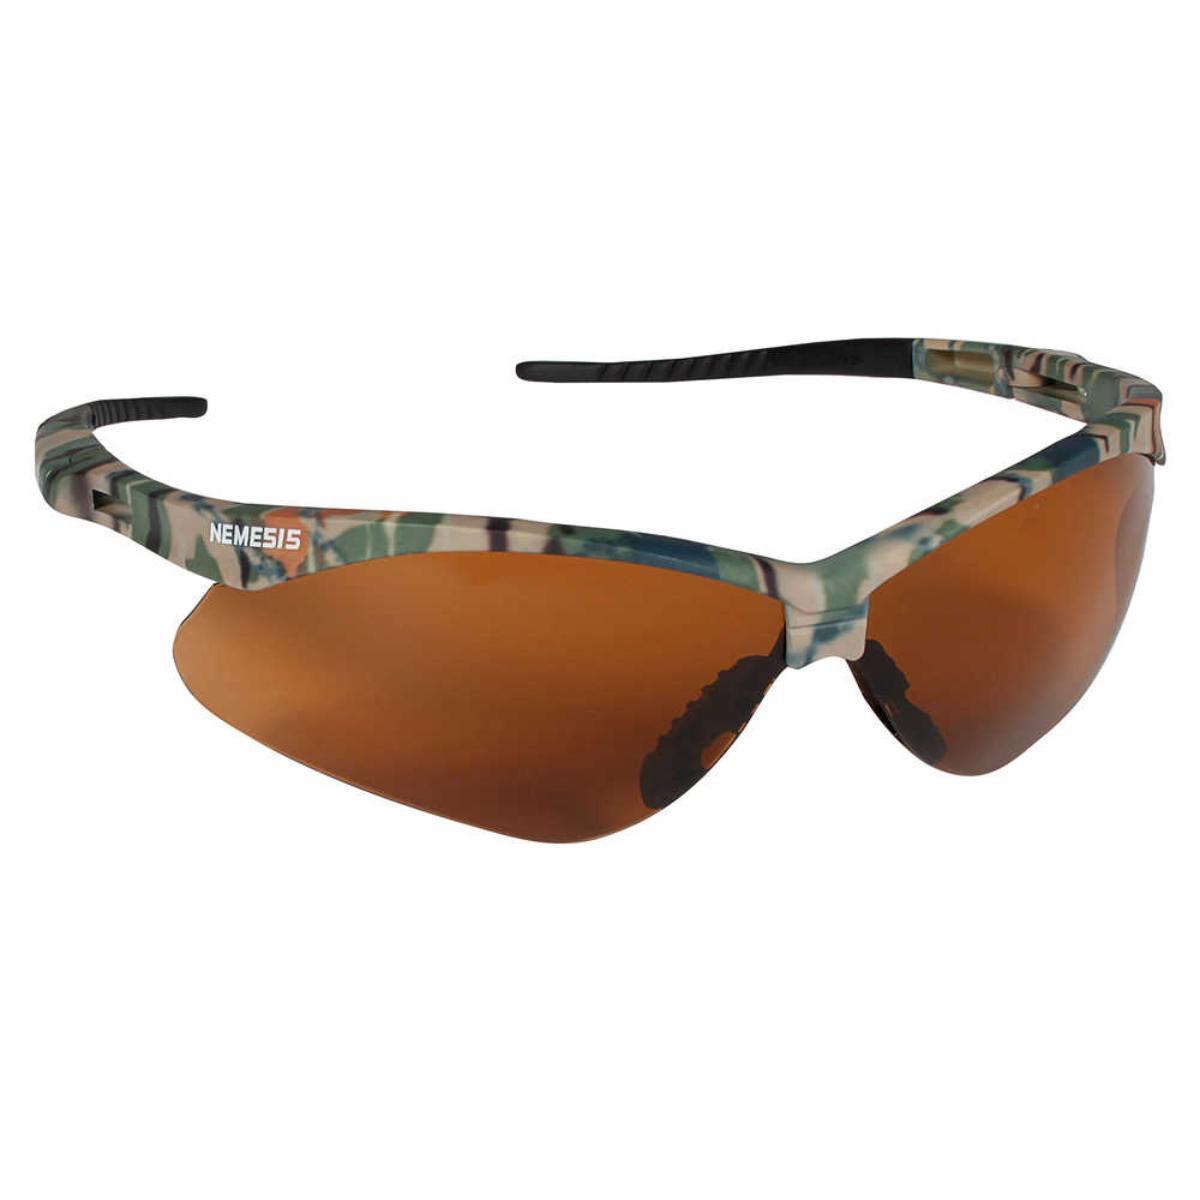 Jackson Safety V30 Nemesis Safety Glasses (19644), Bronze Lenses with Camo Frame, 12 Pairs / Case